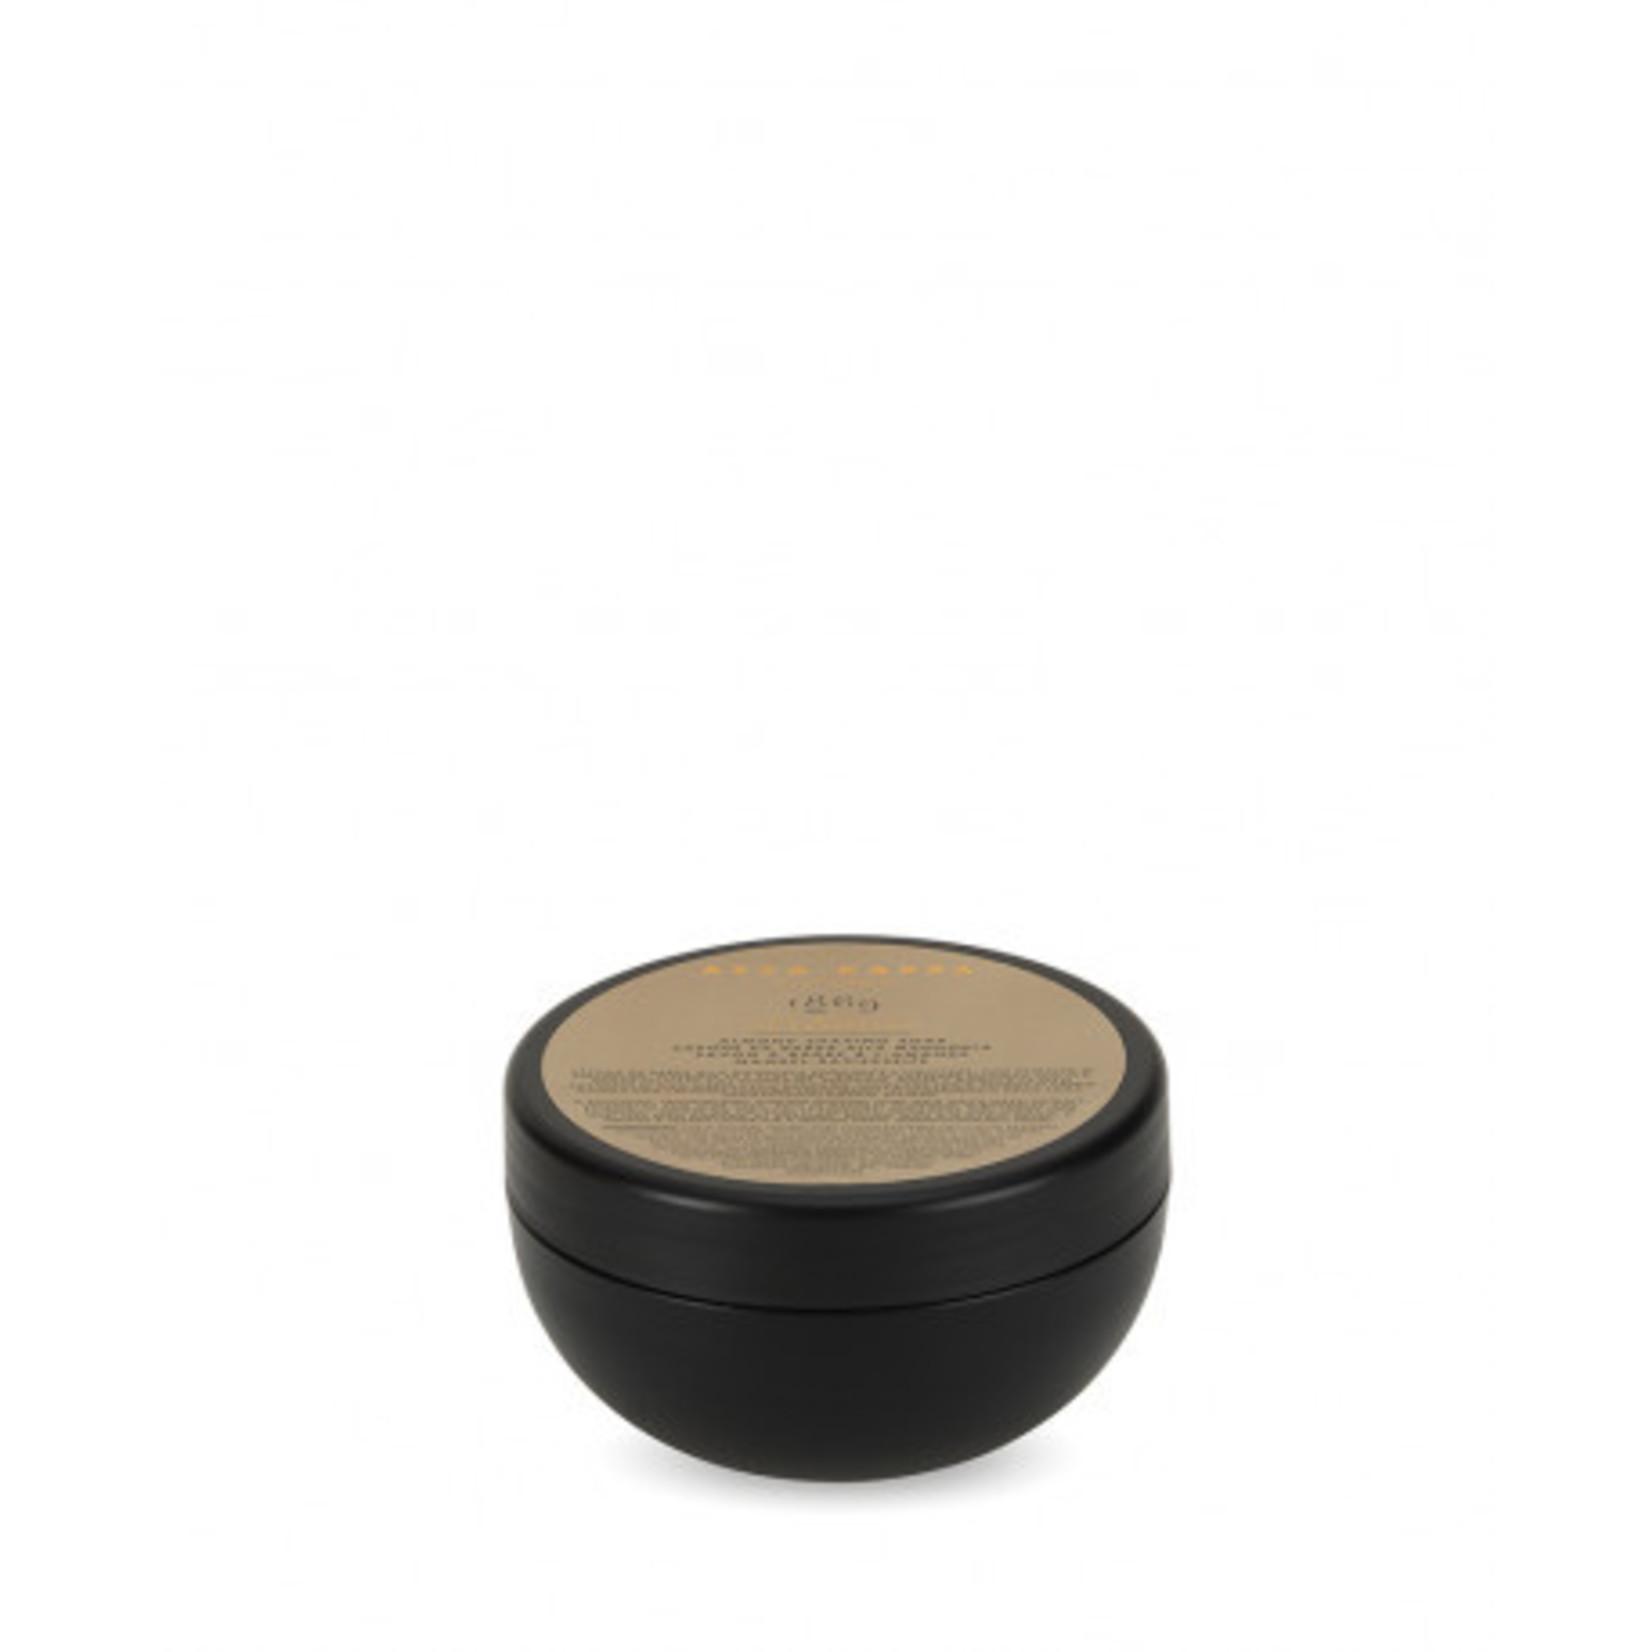 ACCA KAPPA ACCA KAPPA · 1869 SHAVING SOAP (POT) 200ML